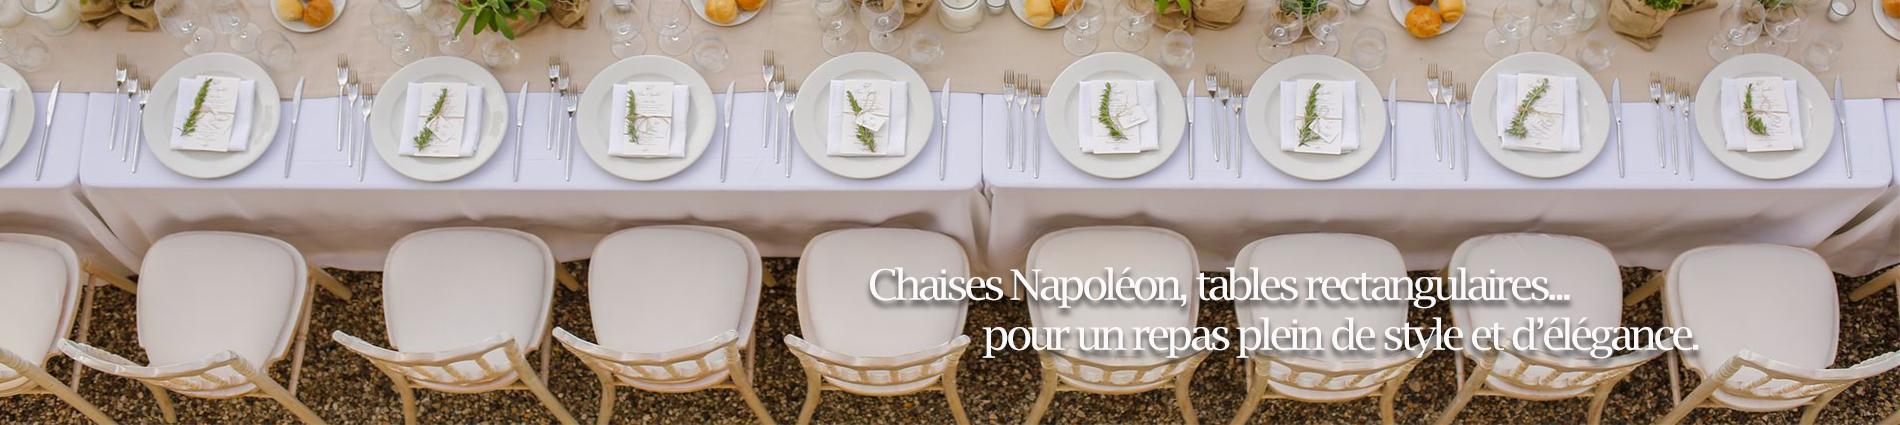 banner table rectangulaire et chaise napoléon